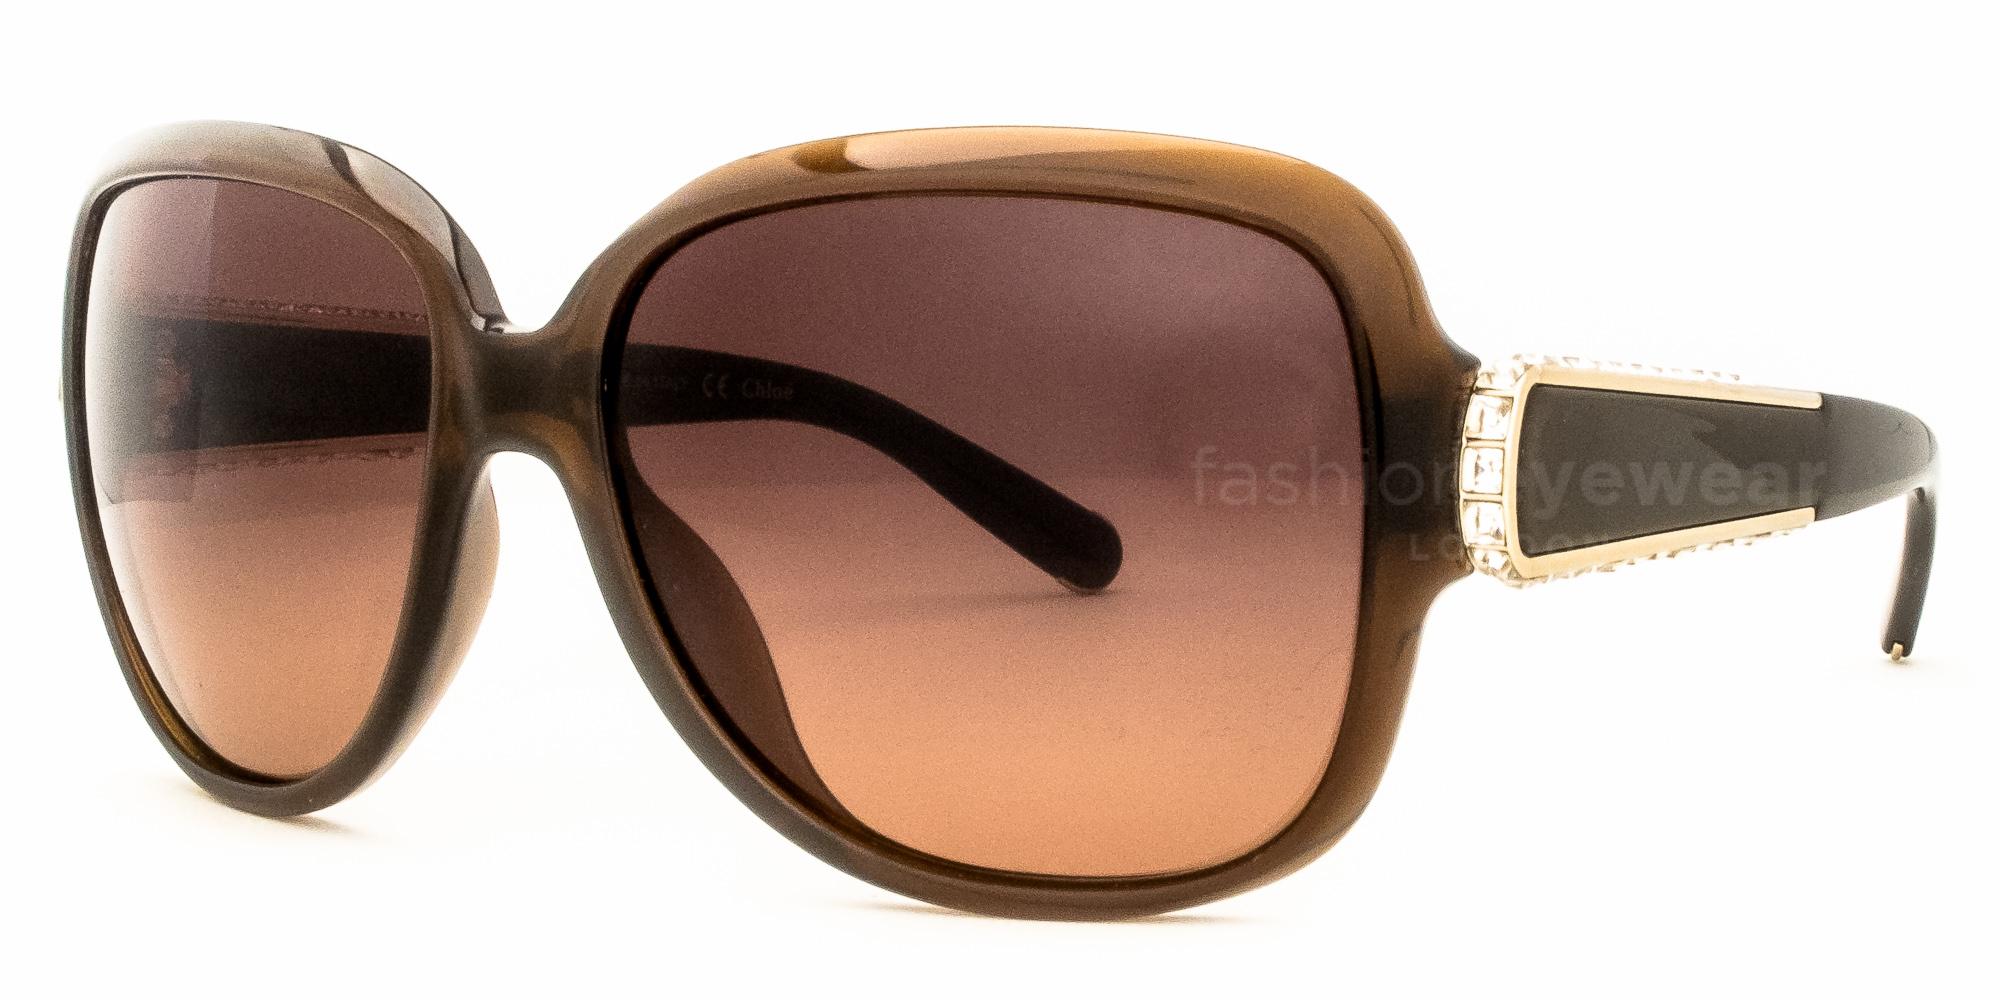 Chloe 612 sunglasses for Decor my eyes